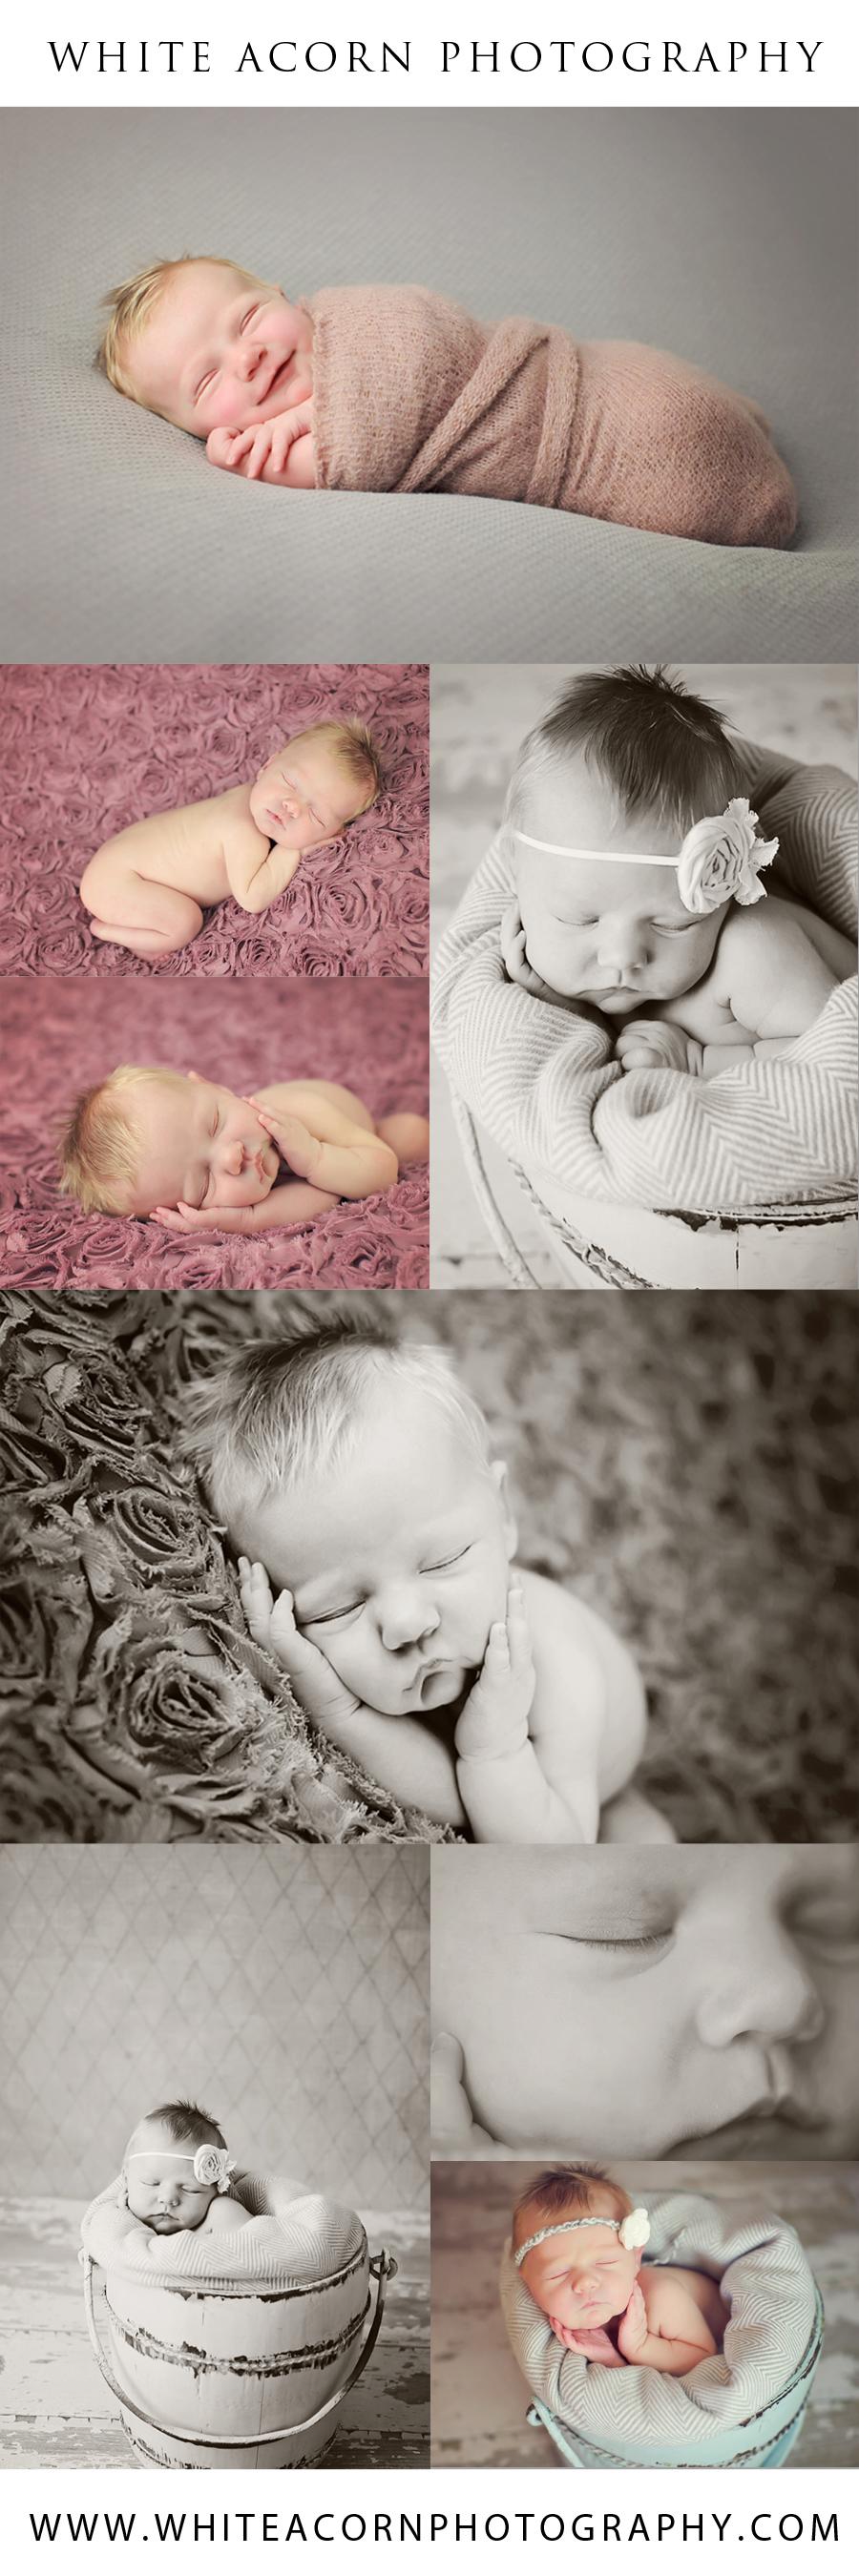 lincoln-ne-newborn-photography-3-11-13